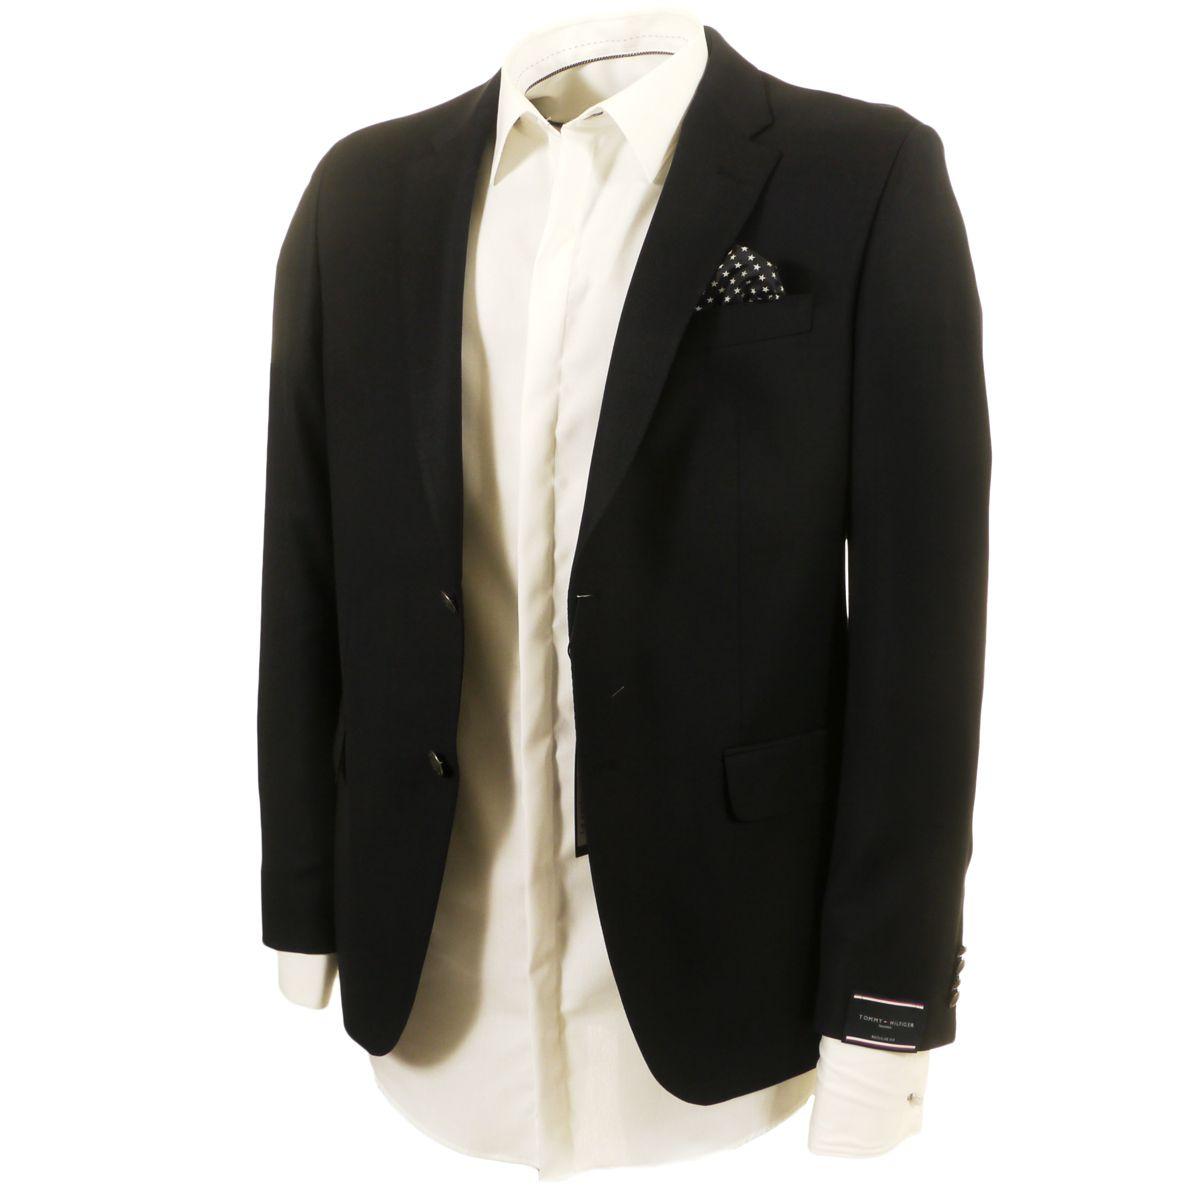 blazer noir homme nike air max prezzo flyknit. Black Bedroom Furniture Sets. Home Design Ideas